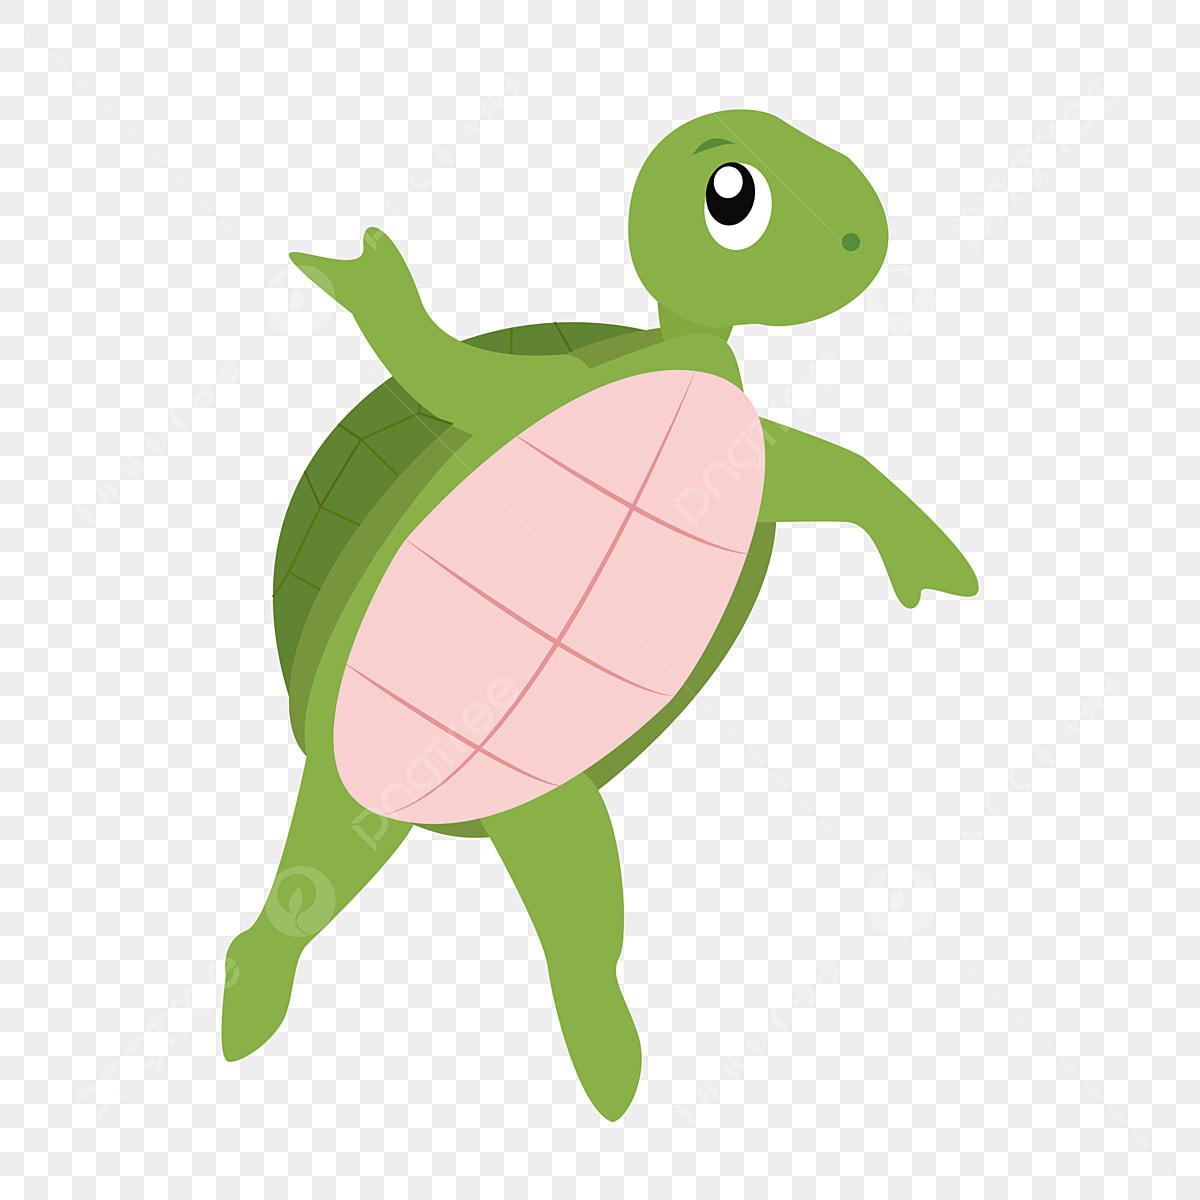 Tortoise Cute Turtle Standing Turtle Animal Lovely Cartoon Hand